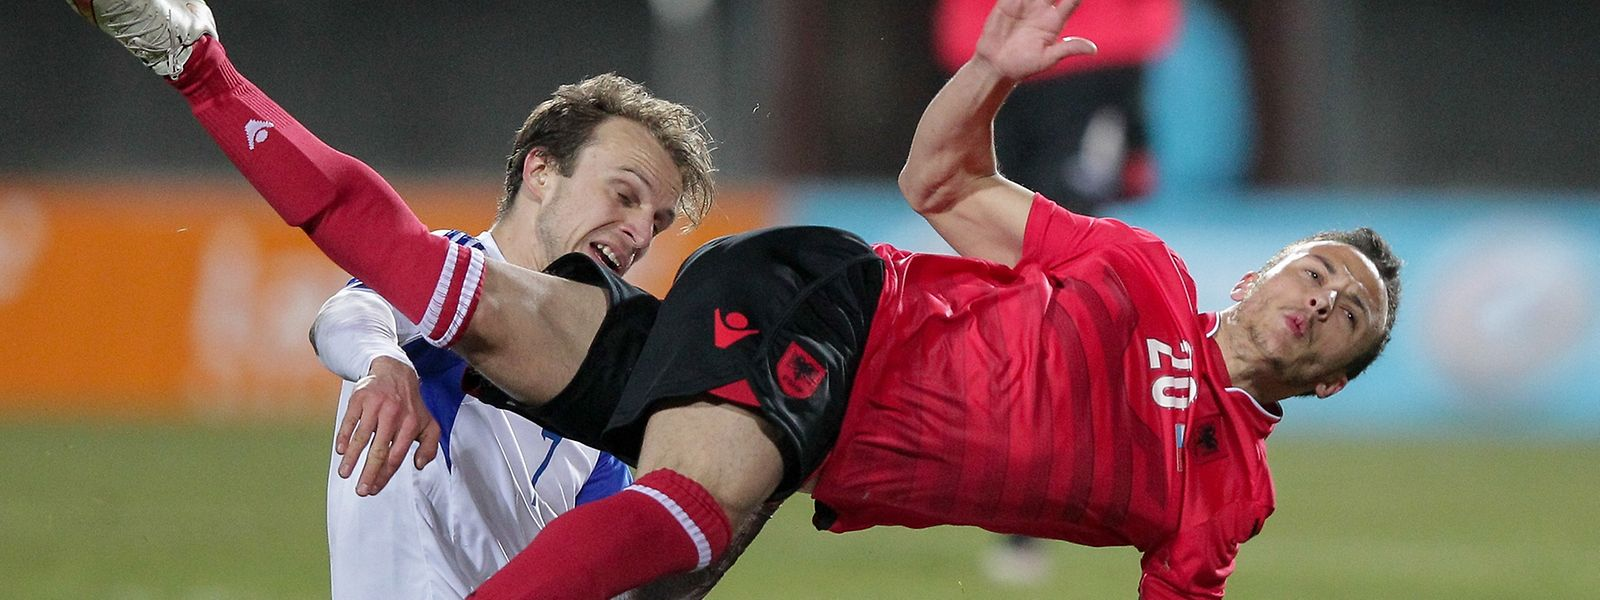 Ergys Kaçe (Nummer 20, hier gegen Luxemburgs Lars Gerson) hätte nicht spielen dürfen.